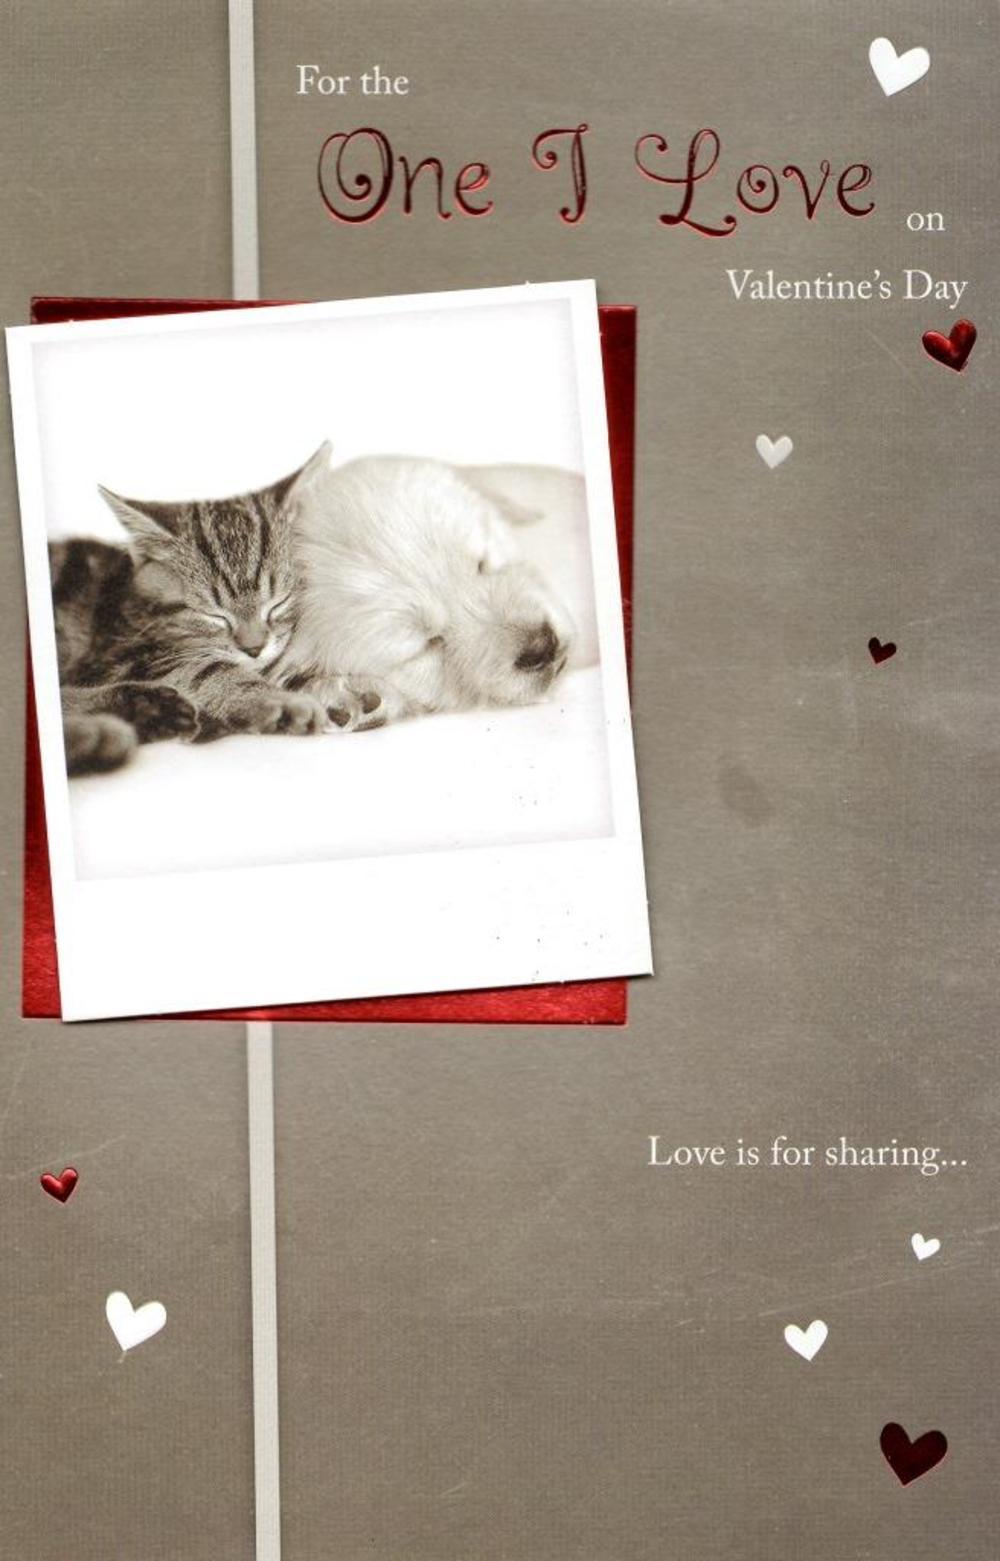 One I Love Cute Valentine's Day Greeting Card